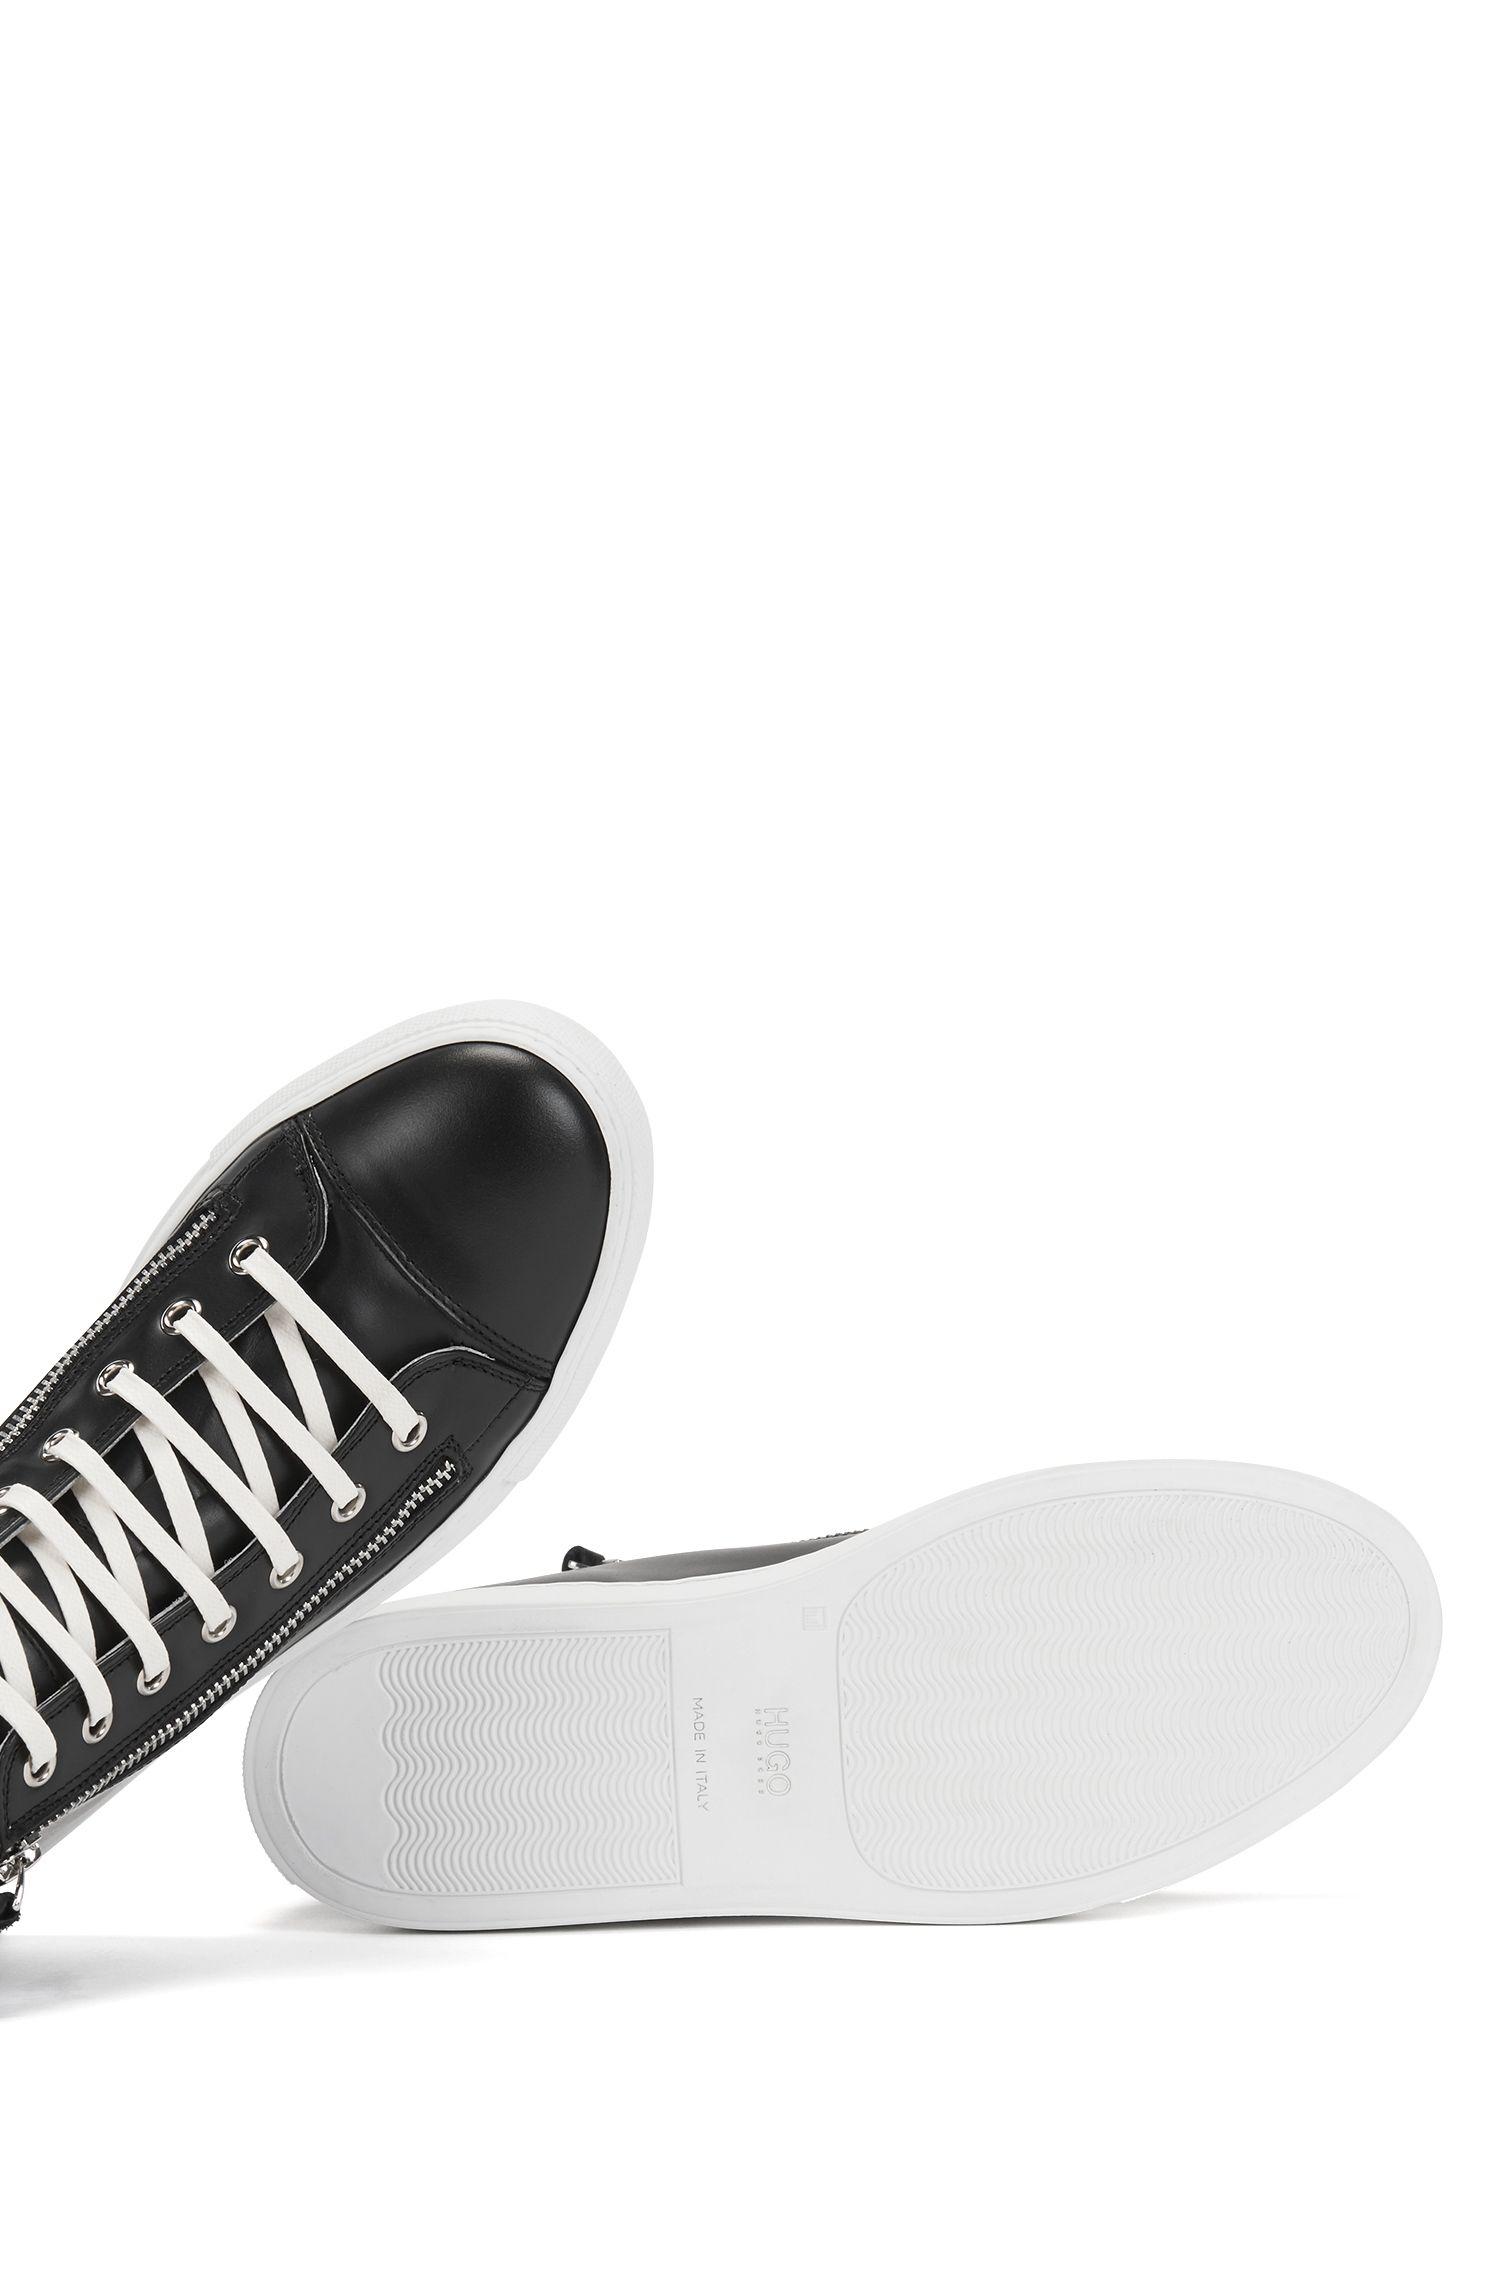 Hoge sneakers van Italiaans leer, met ritsdetail, Zwart